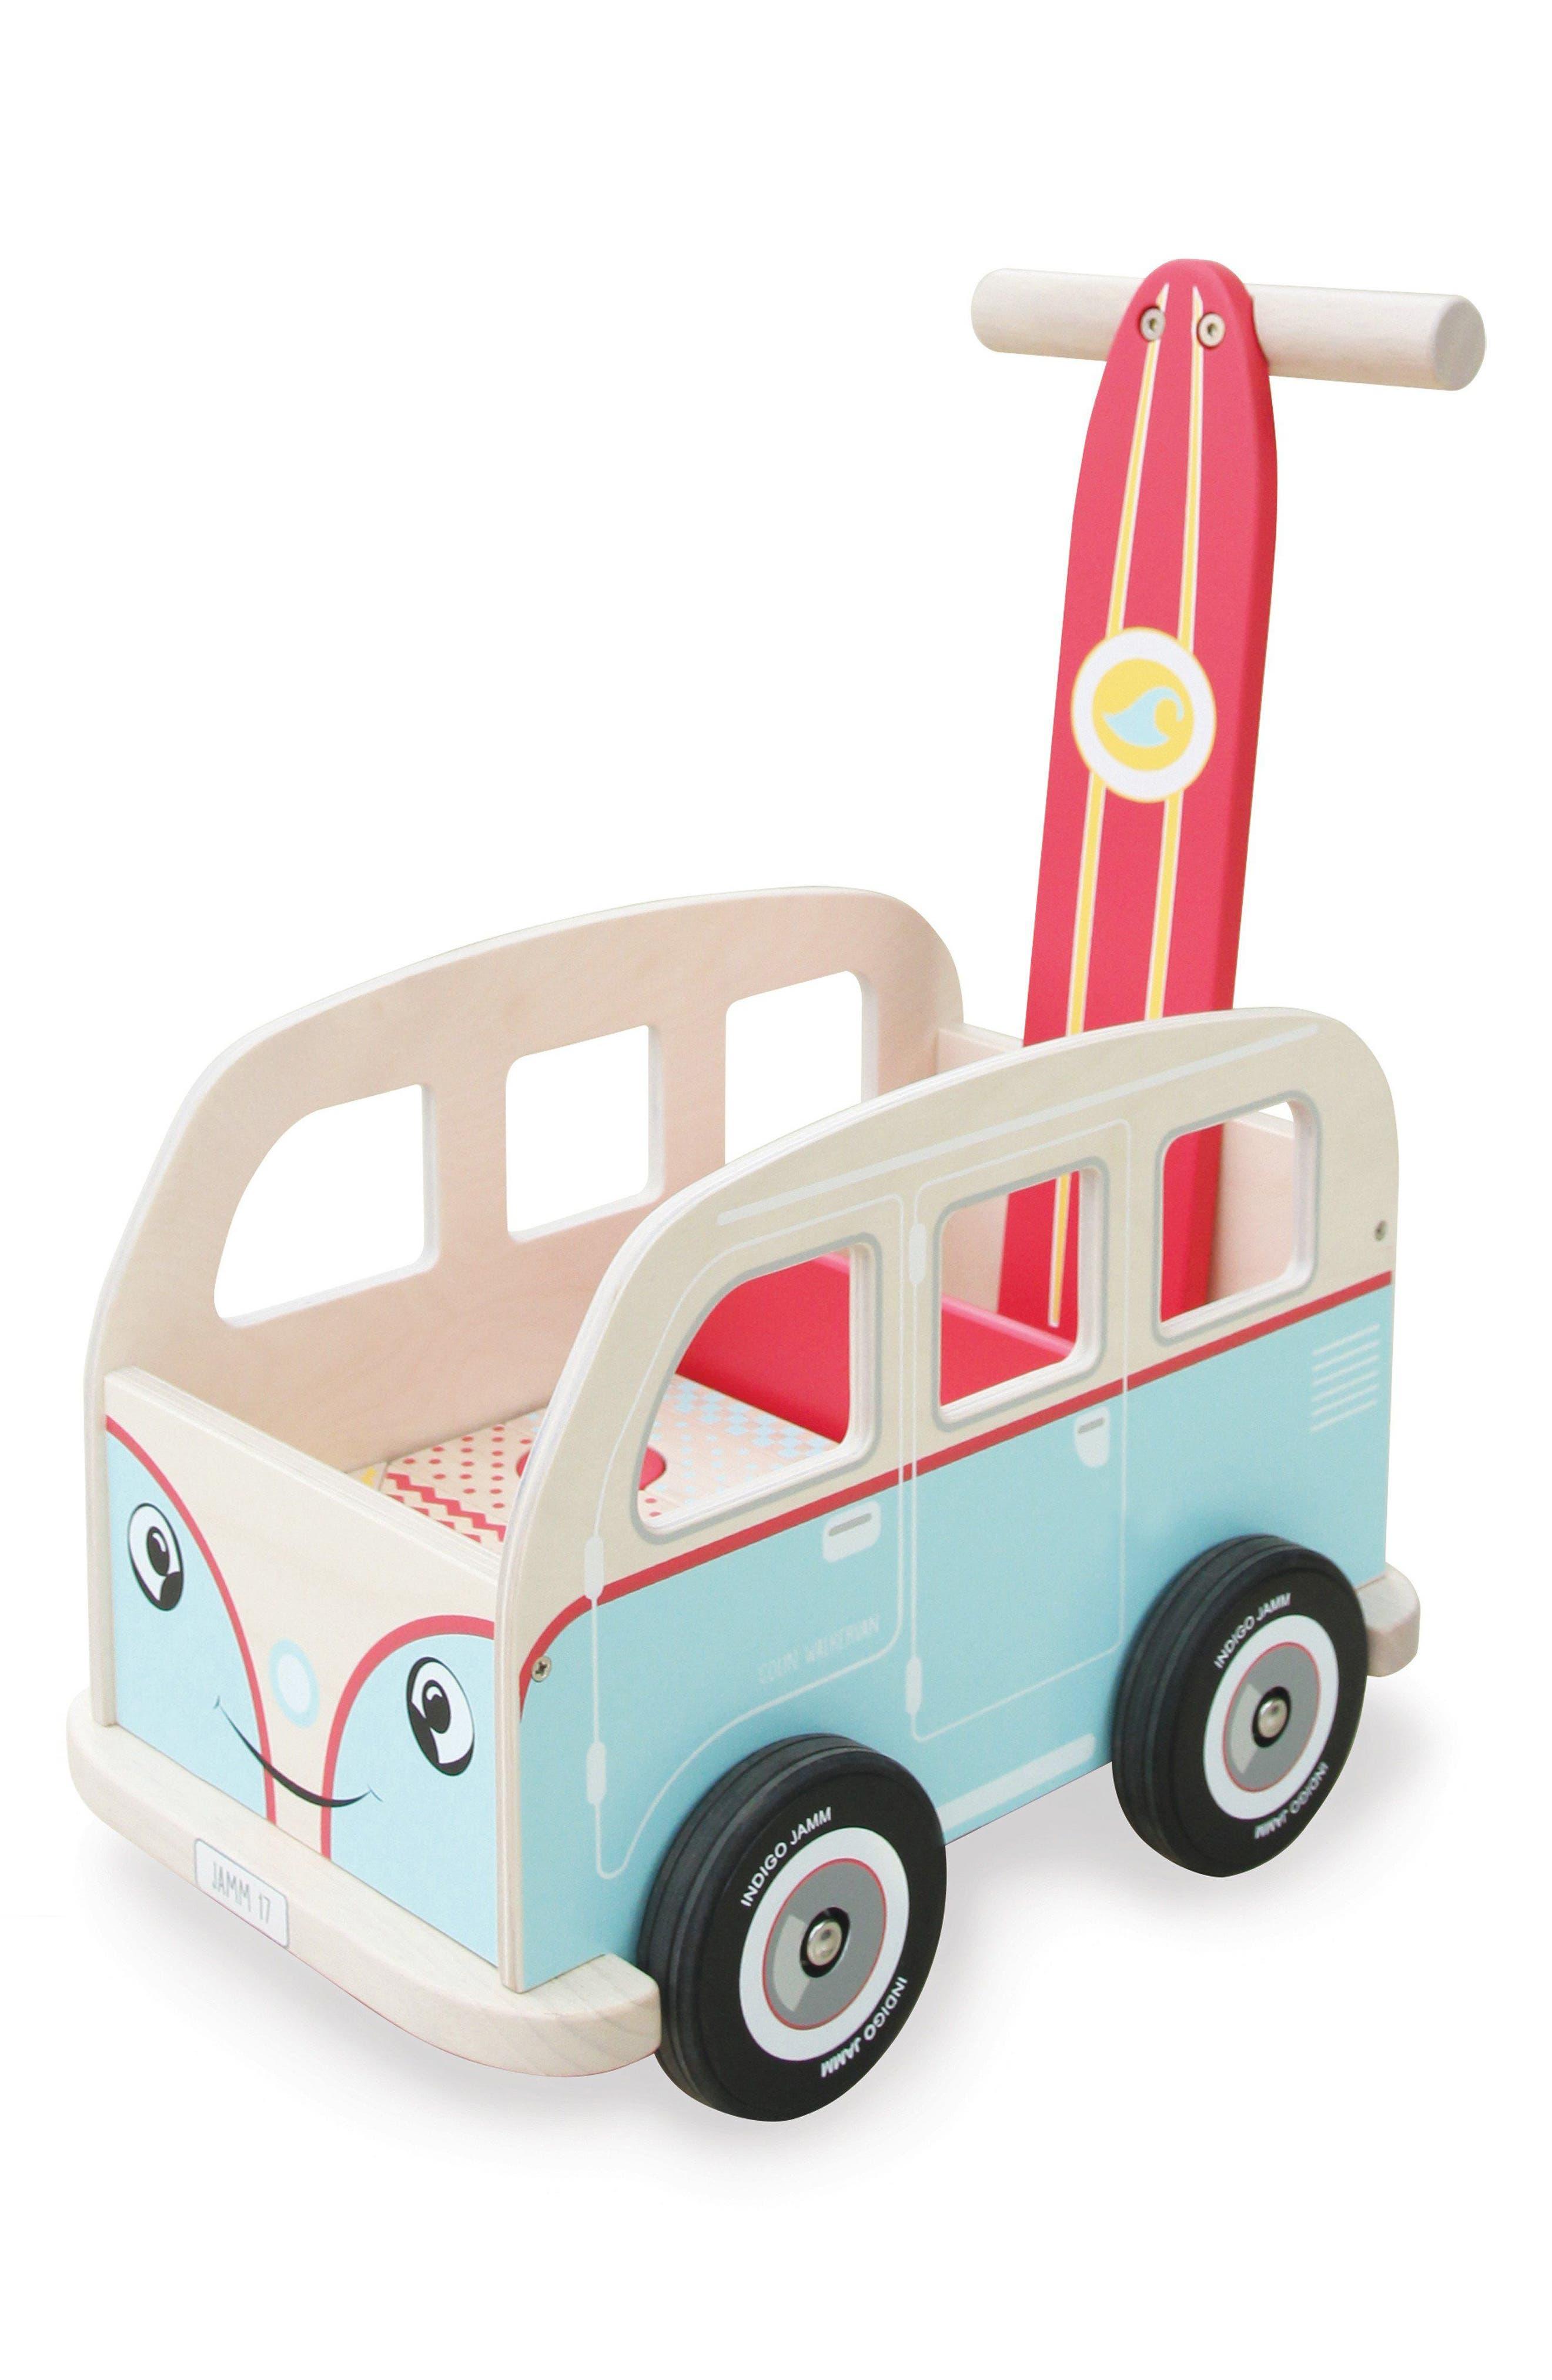 Alternate Image 1 Selected - Indigo Jamm Van Push Toy